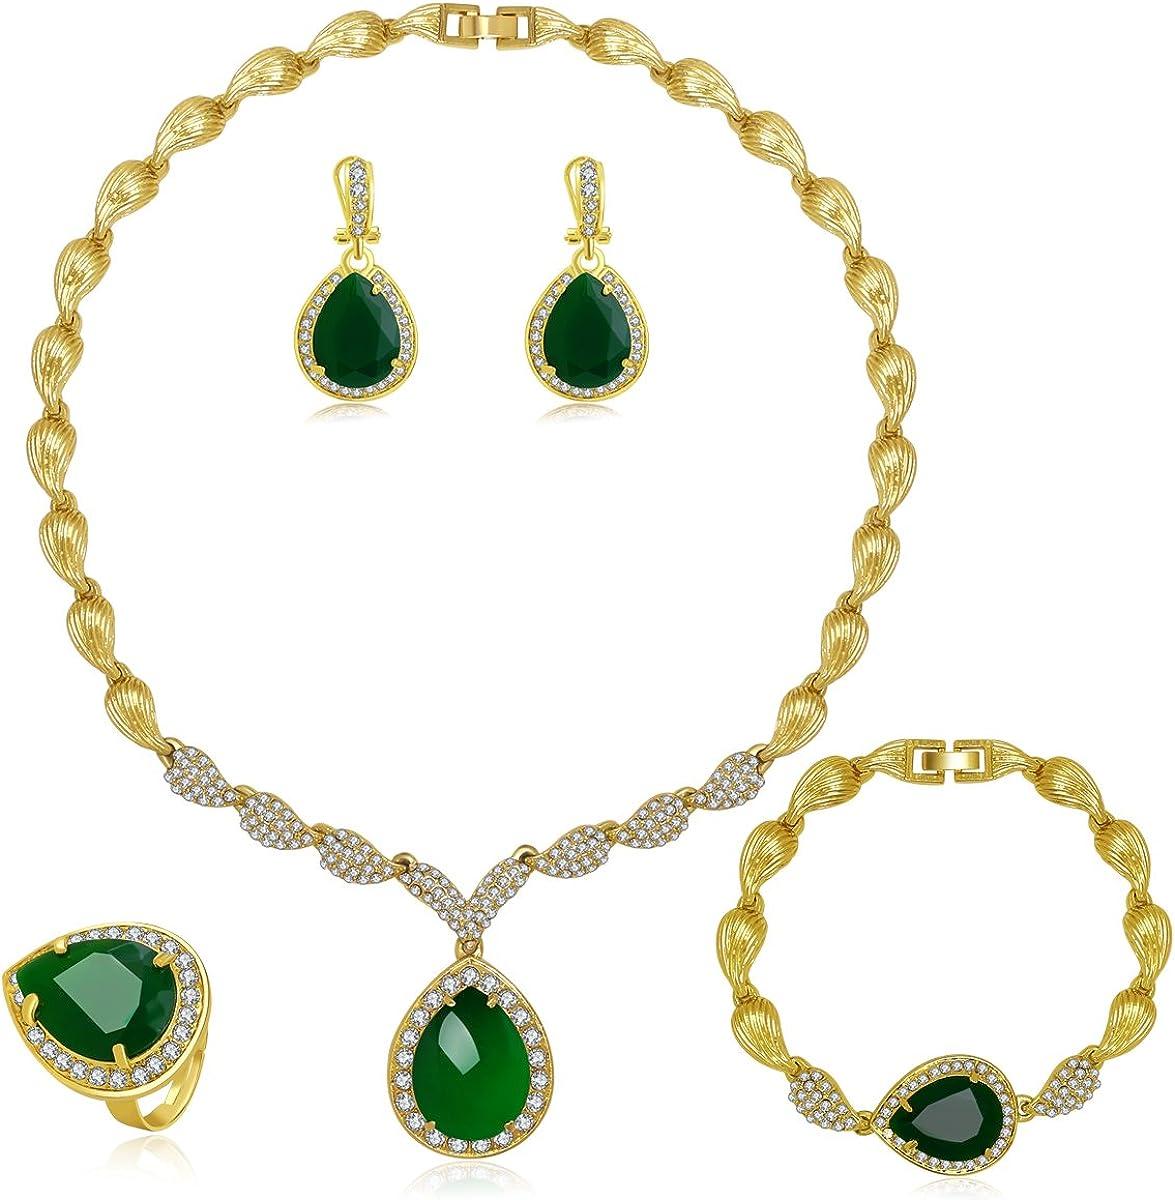 MOOCHI Women Gold Plated Green/Red Cubic Zirconia Teardrop Pendant Rhinestone Jewelry Set Necklace Earrings Bracelet Ring for Wedding Costume Statement